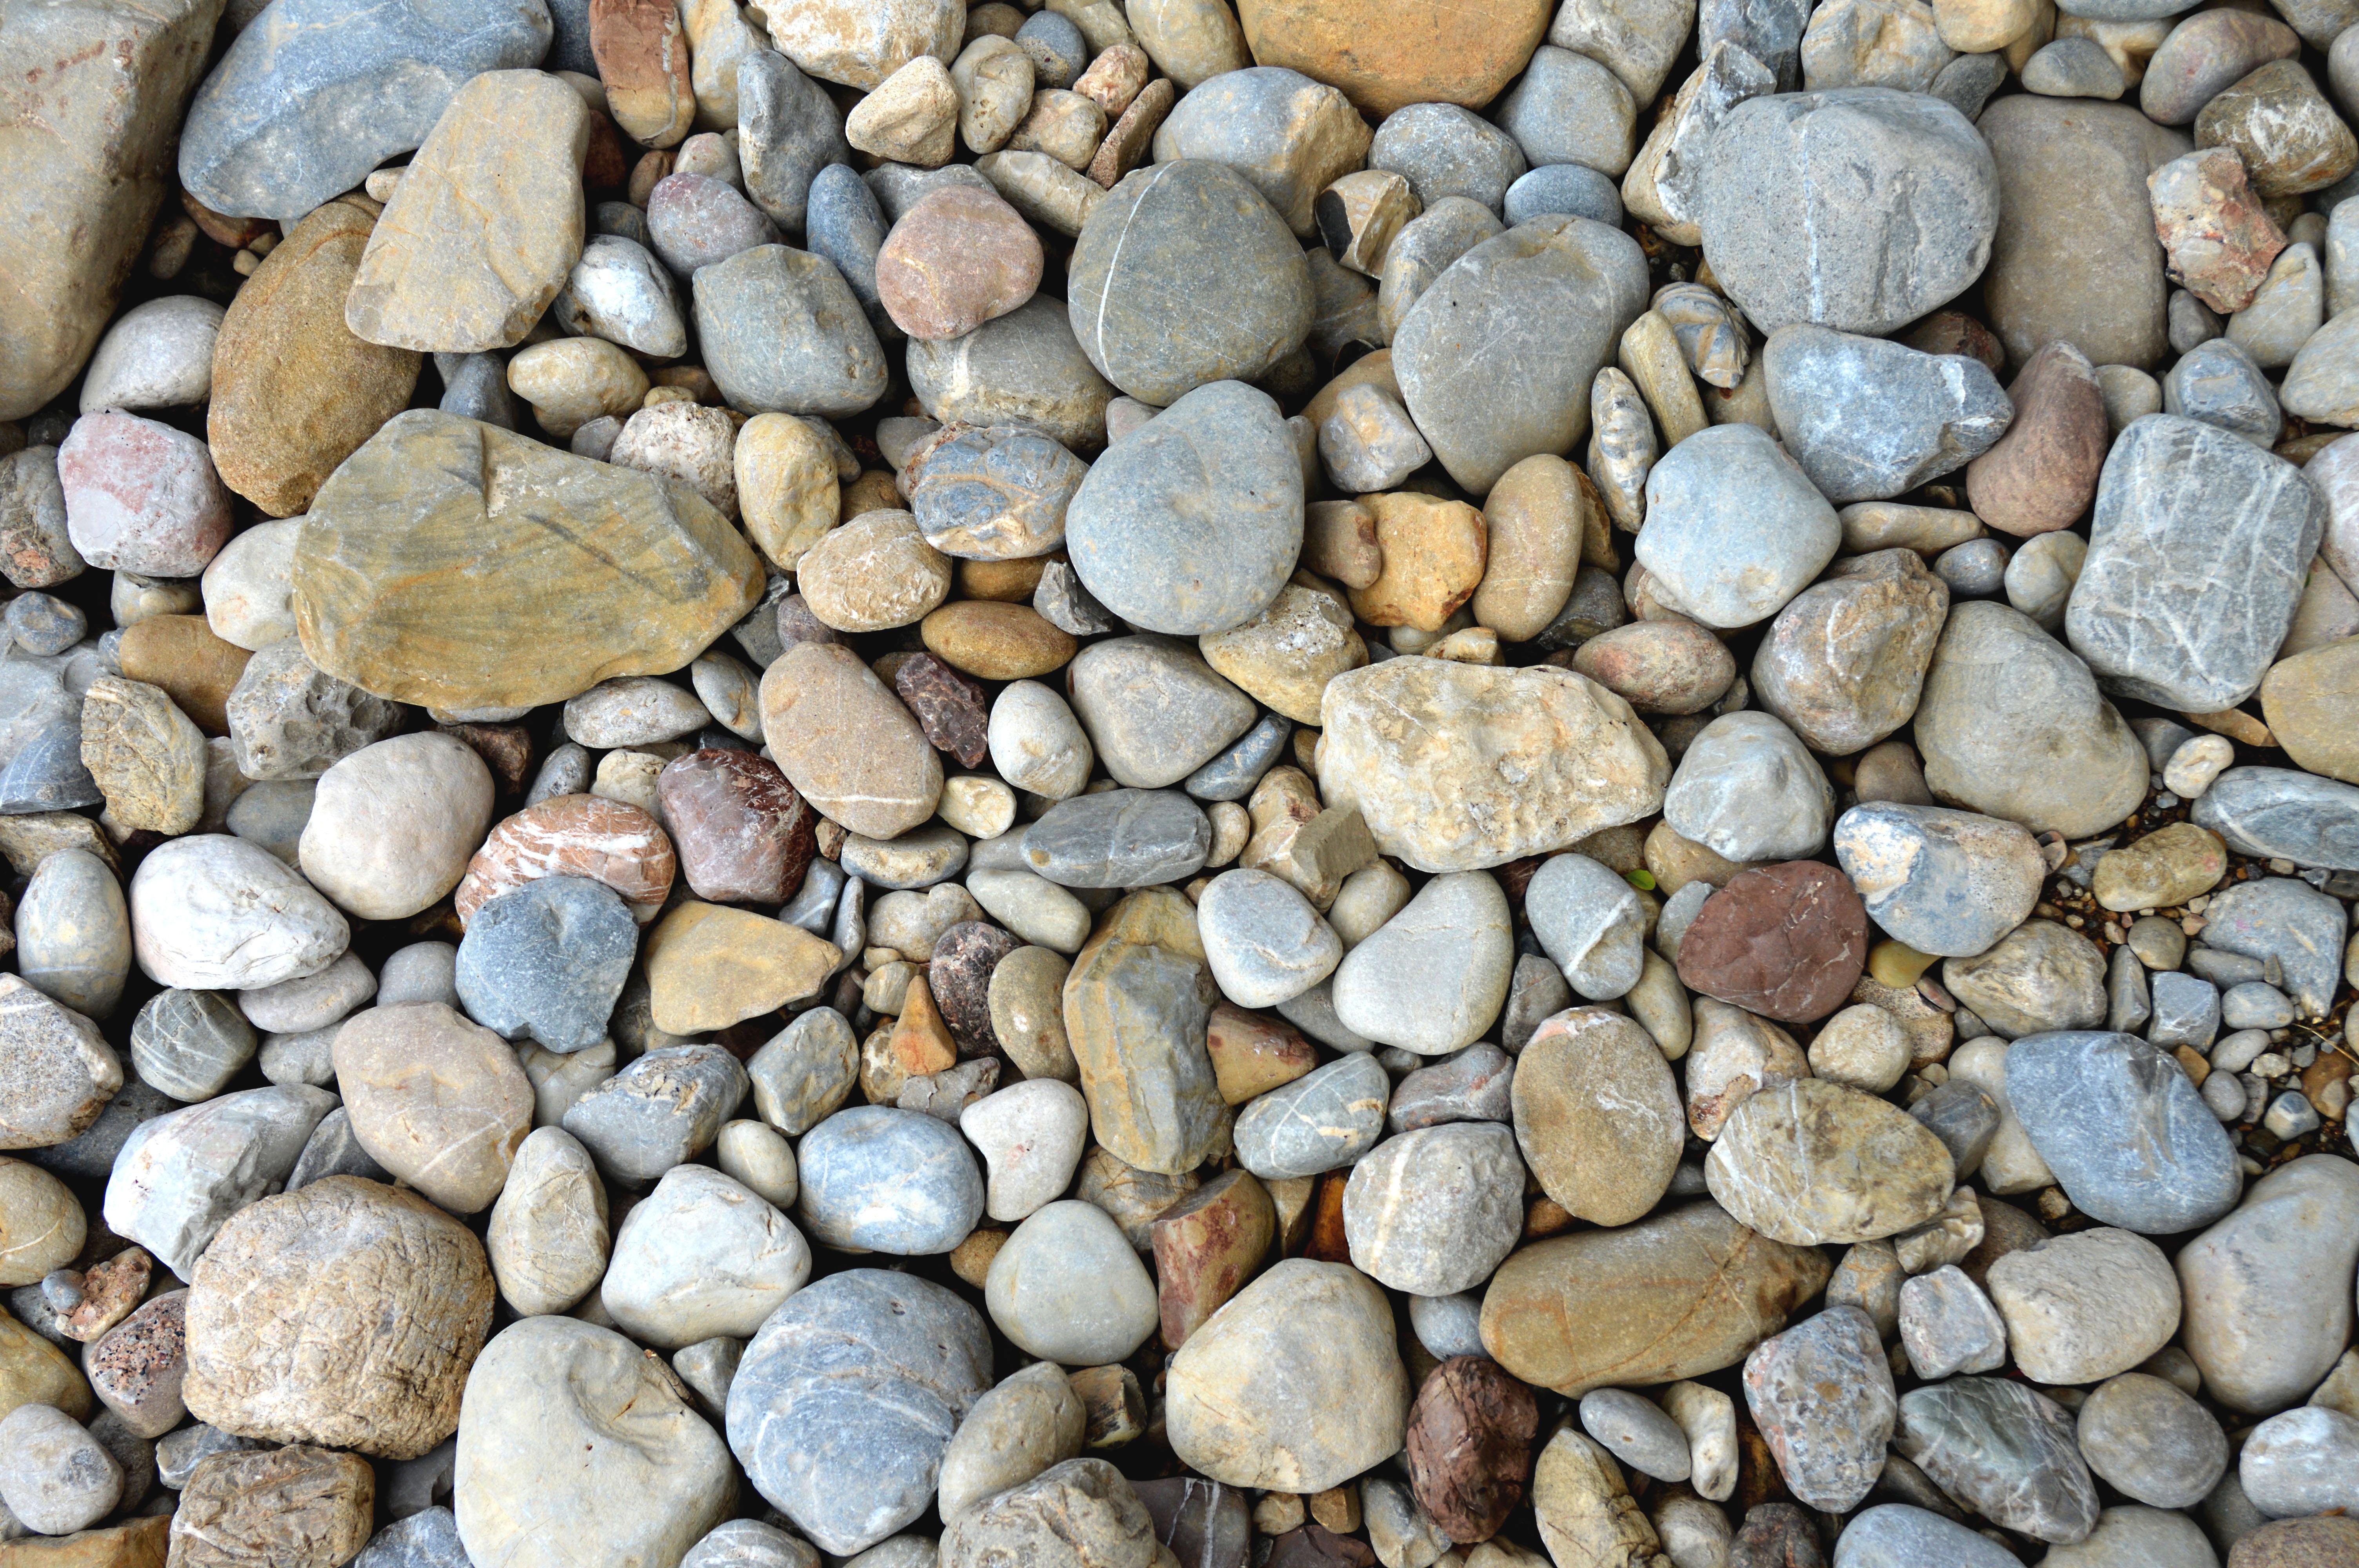 Rock Texture River Pebble Soil Stone Wall Garden Material Stones Rubble  Background Design Gravel Pebbles Graphic